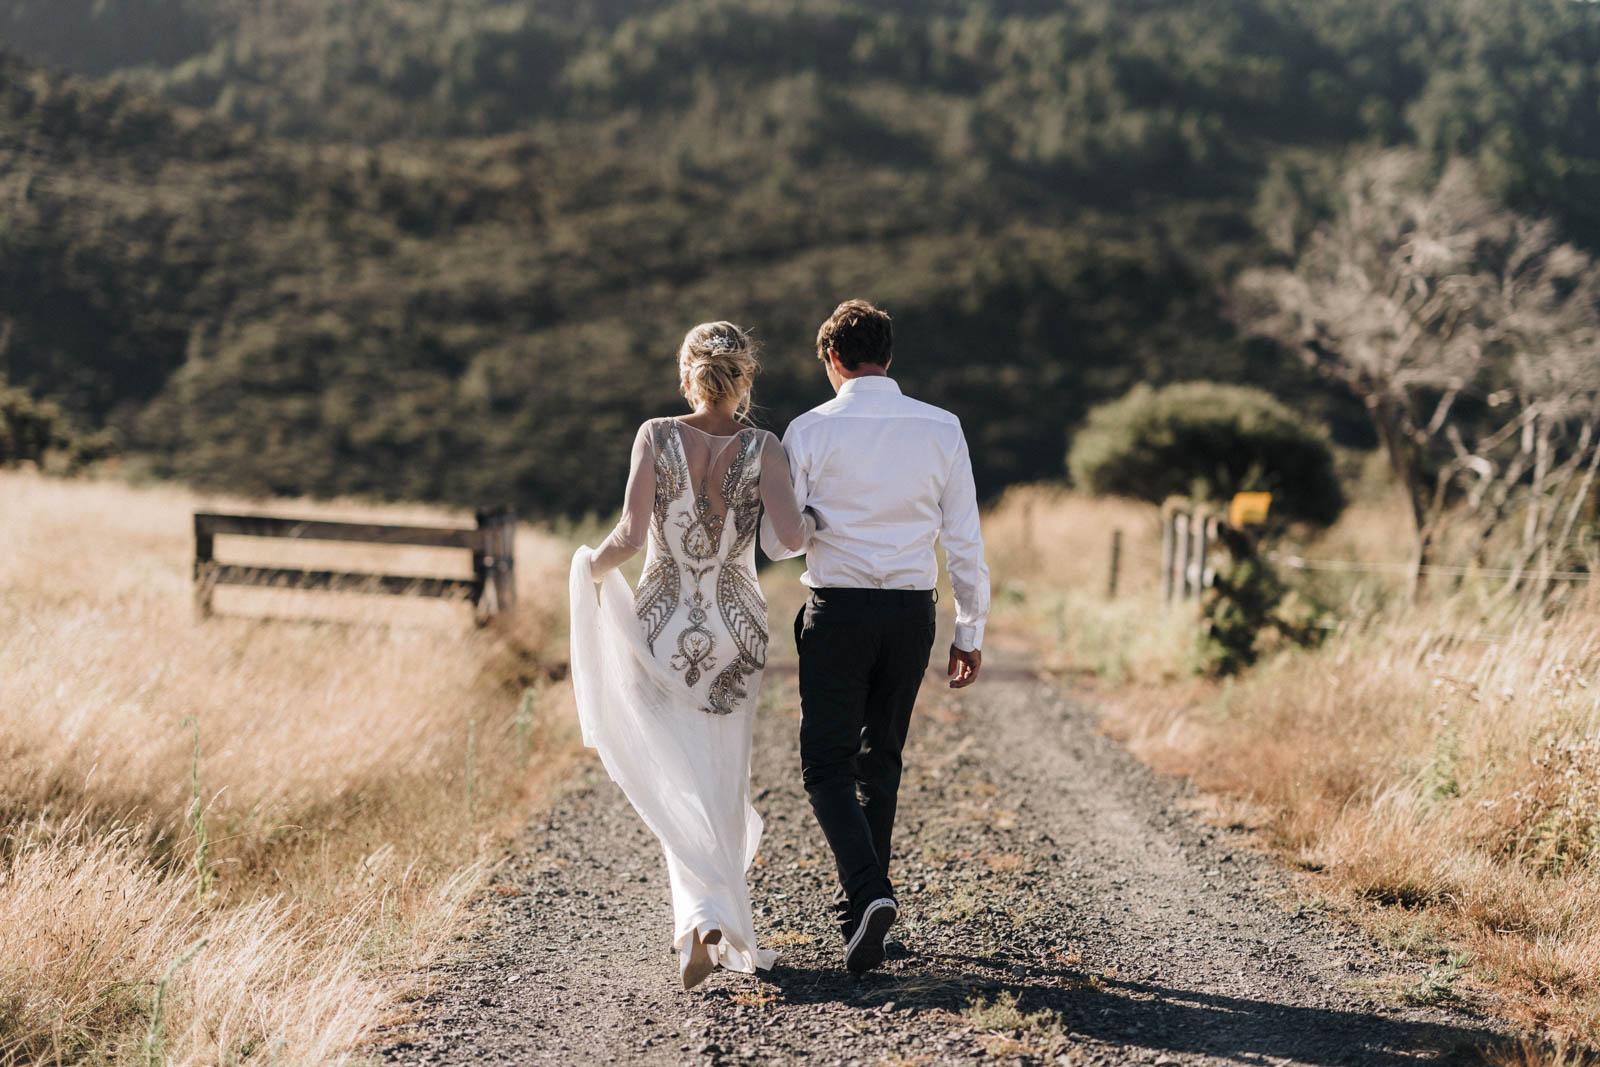 newfound-l-i-coromandel-wedding-photographer-1804-A9_04108